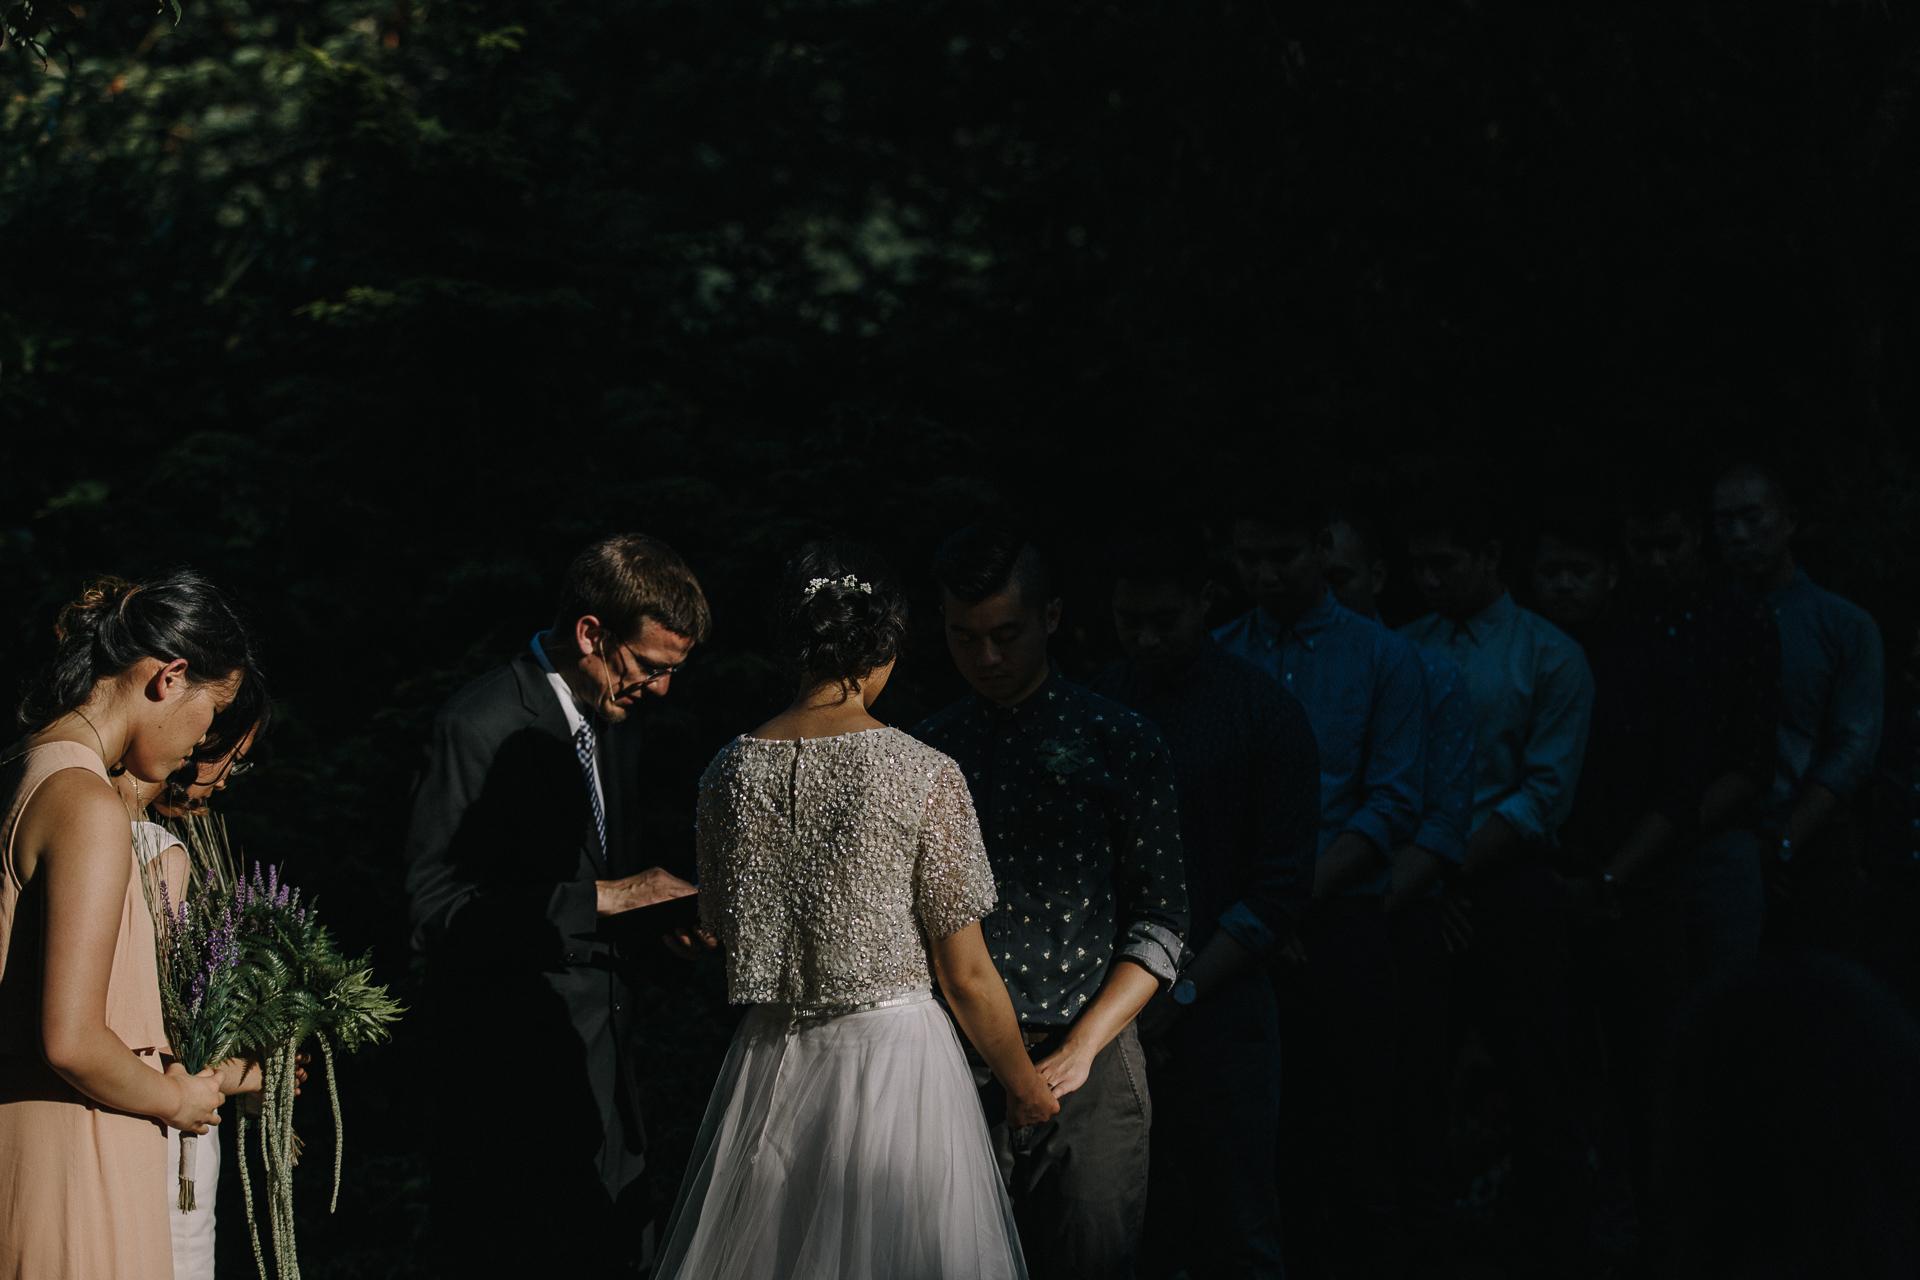 jess-hunter-seattle-artistic-wedding-photographer-3623.jpg